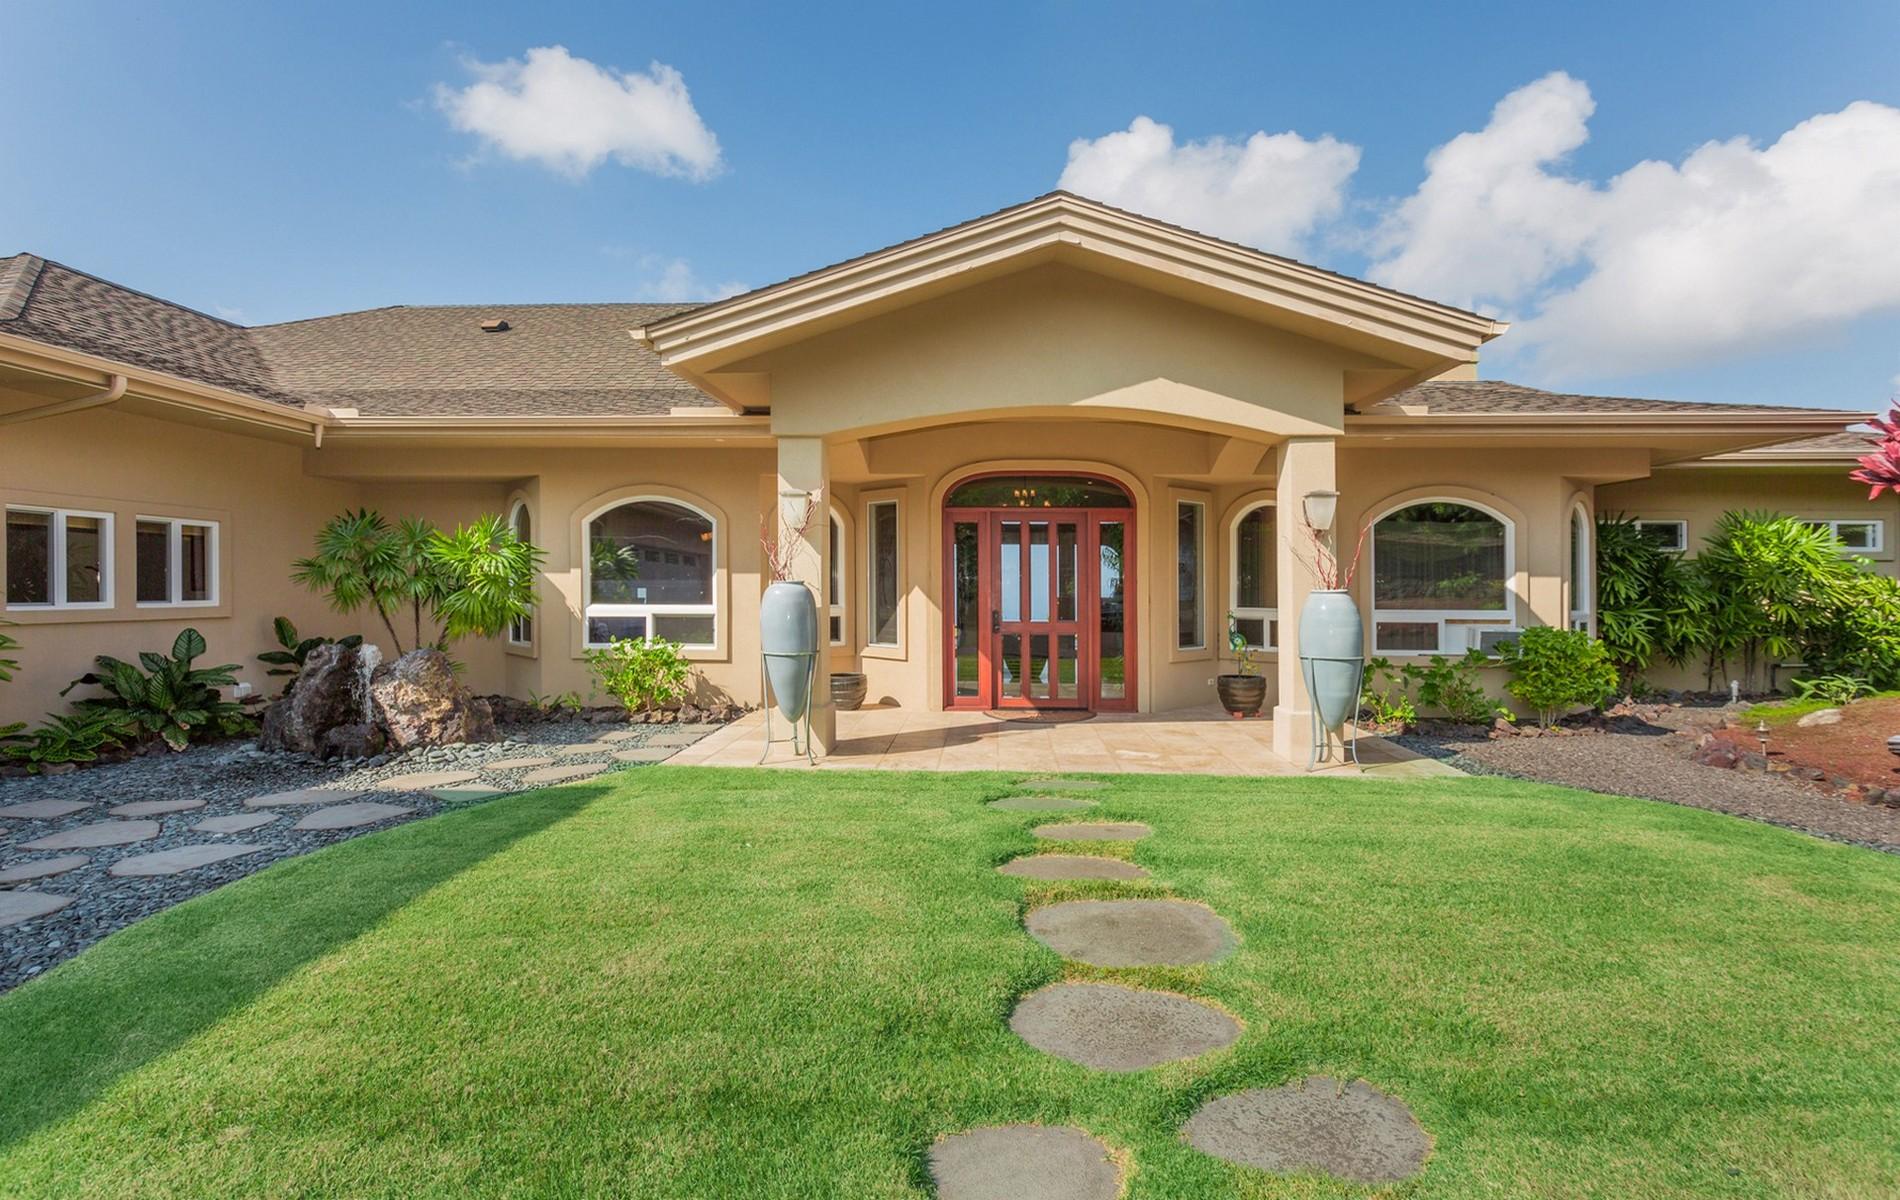 Moradia para Venda às Makalei Estates 72-4085 Alahee Pl Kailua-Kona, Havaí, 96740 Estados Unidos